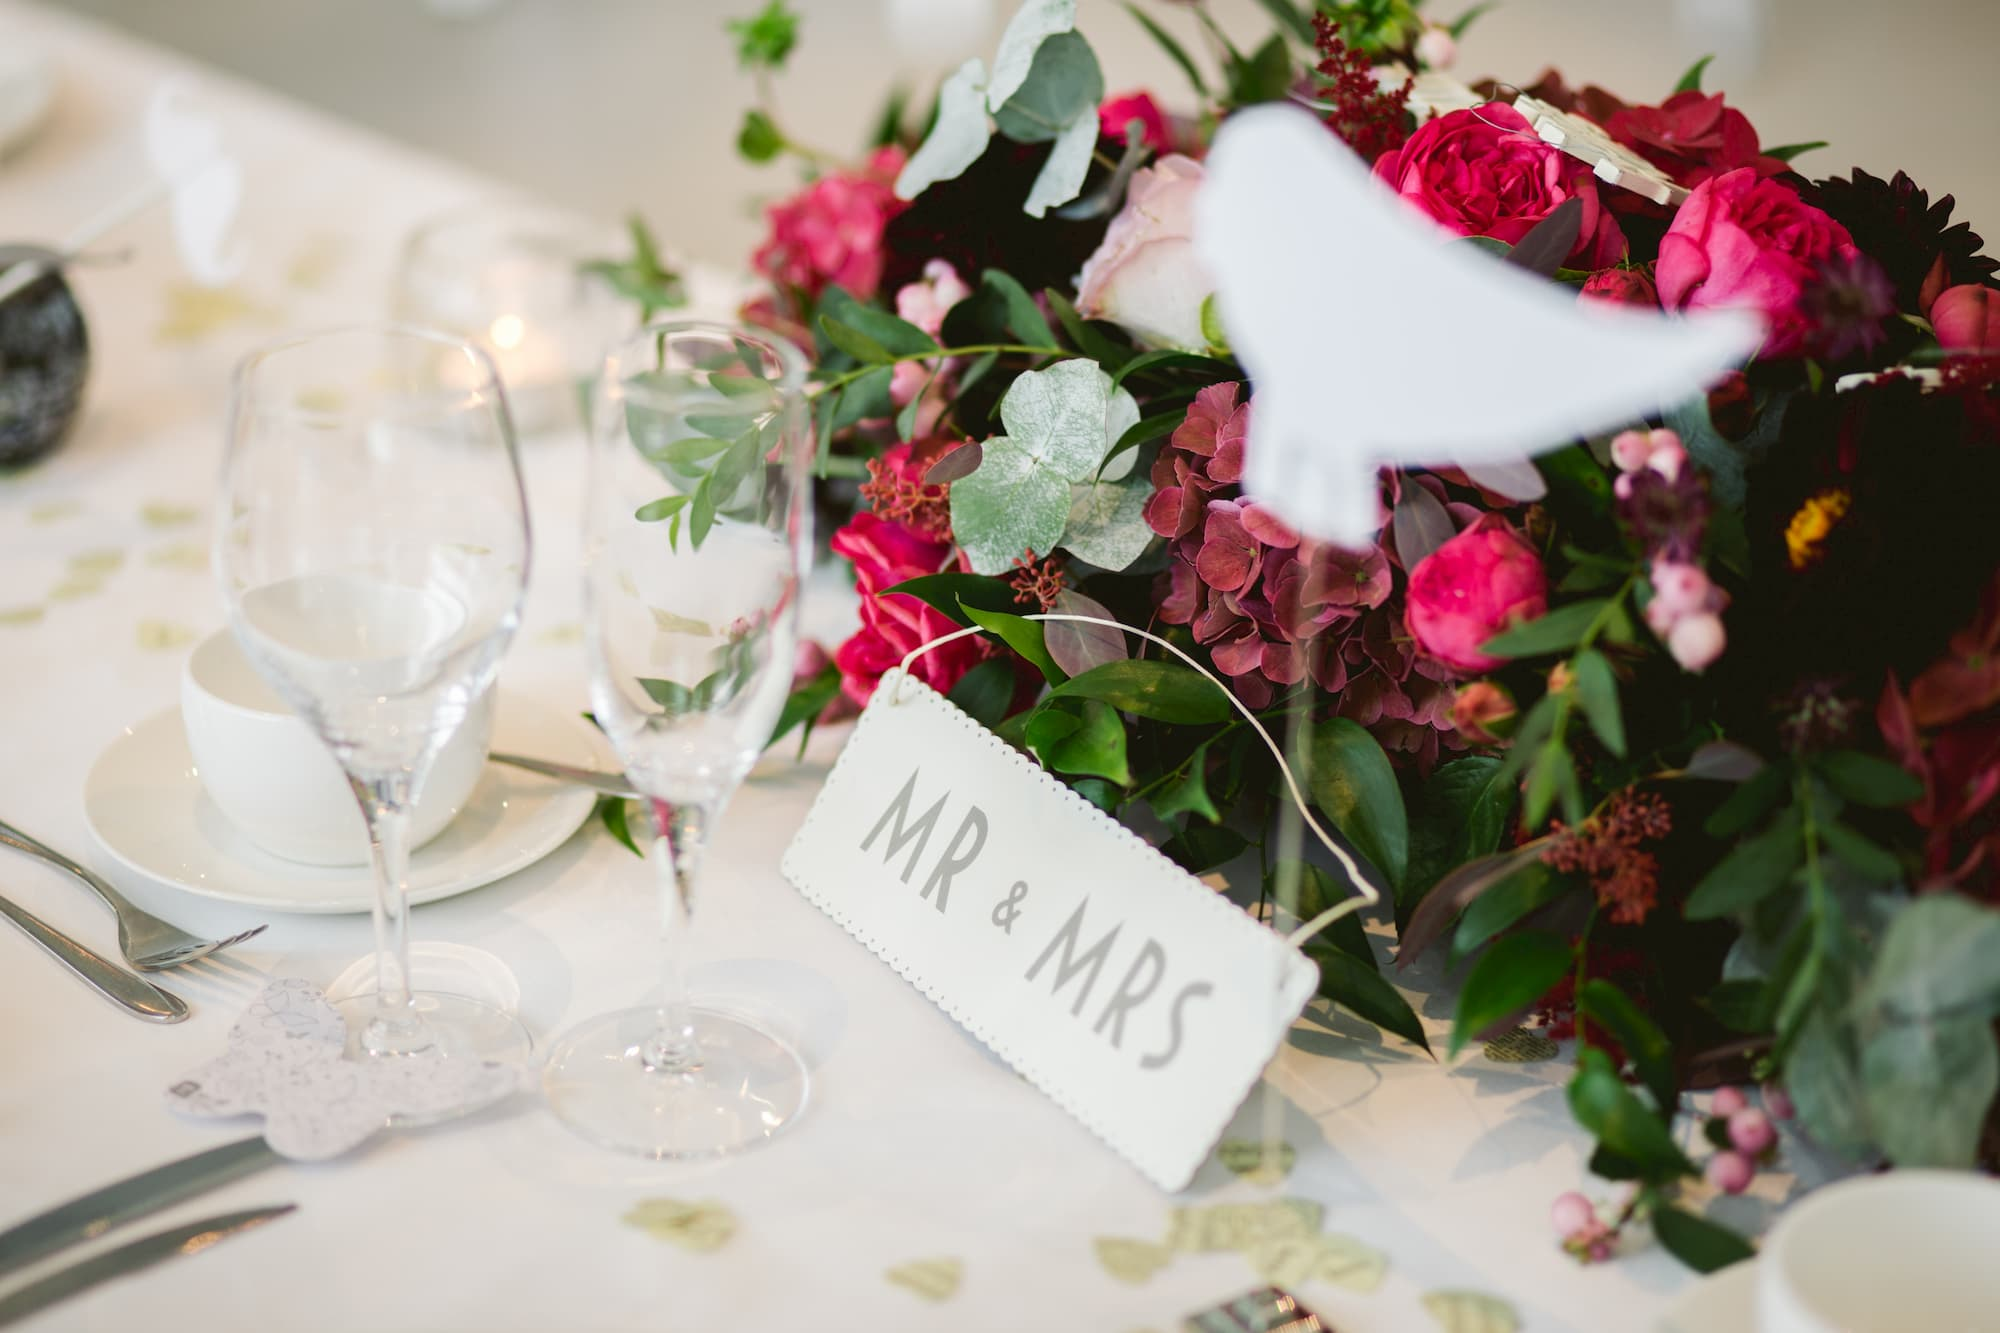 Verlovingscadeau ideeën en tips